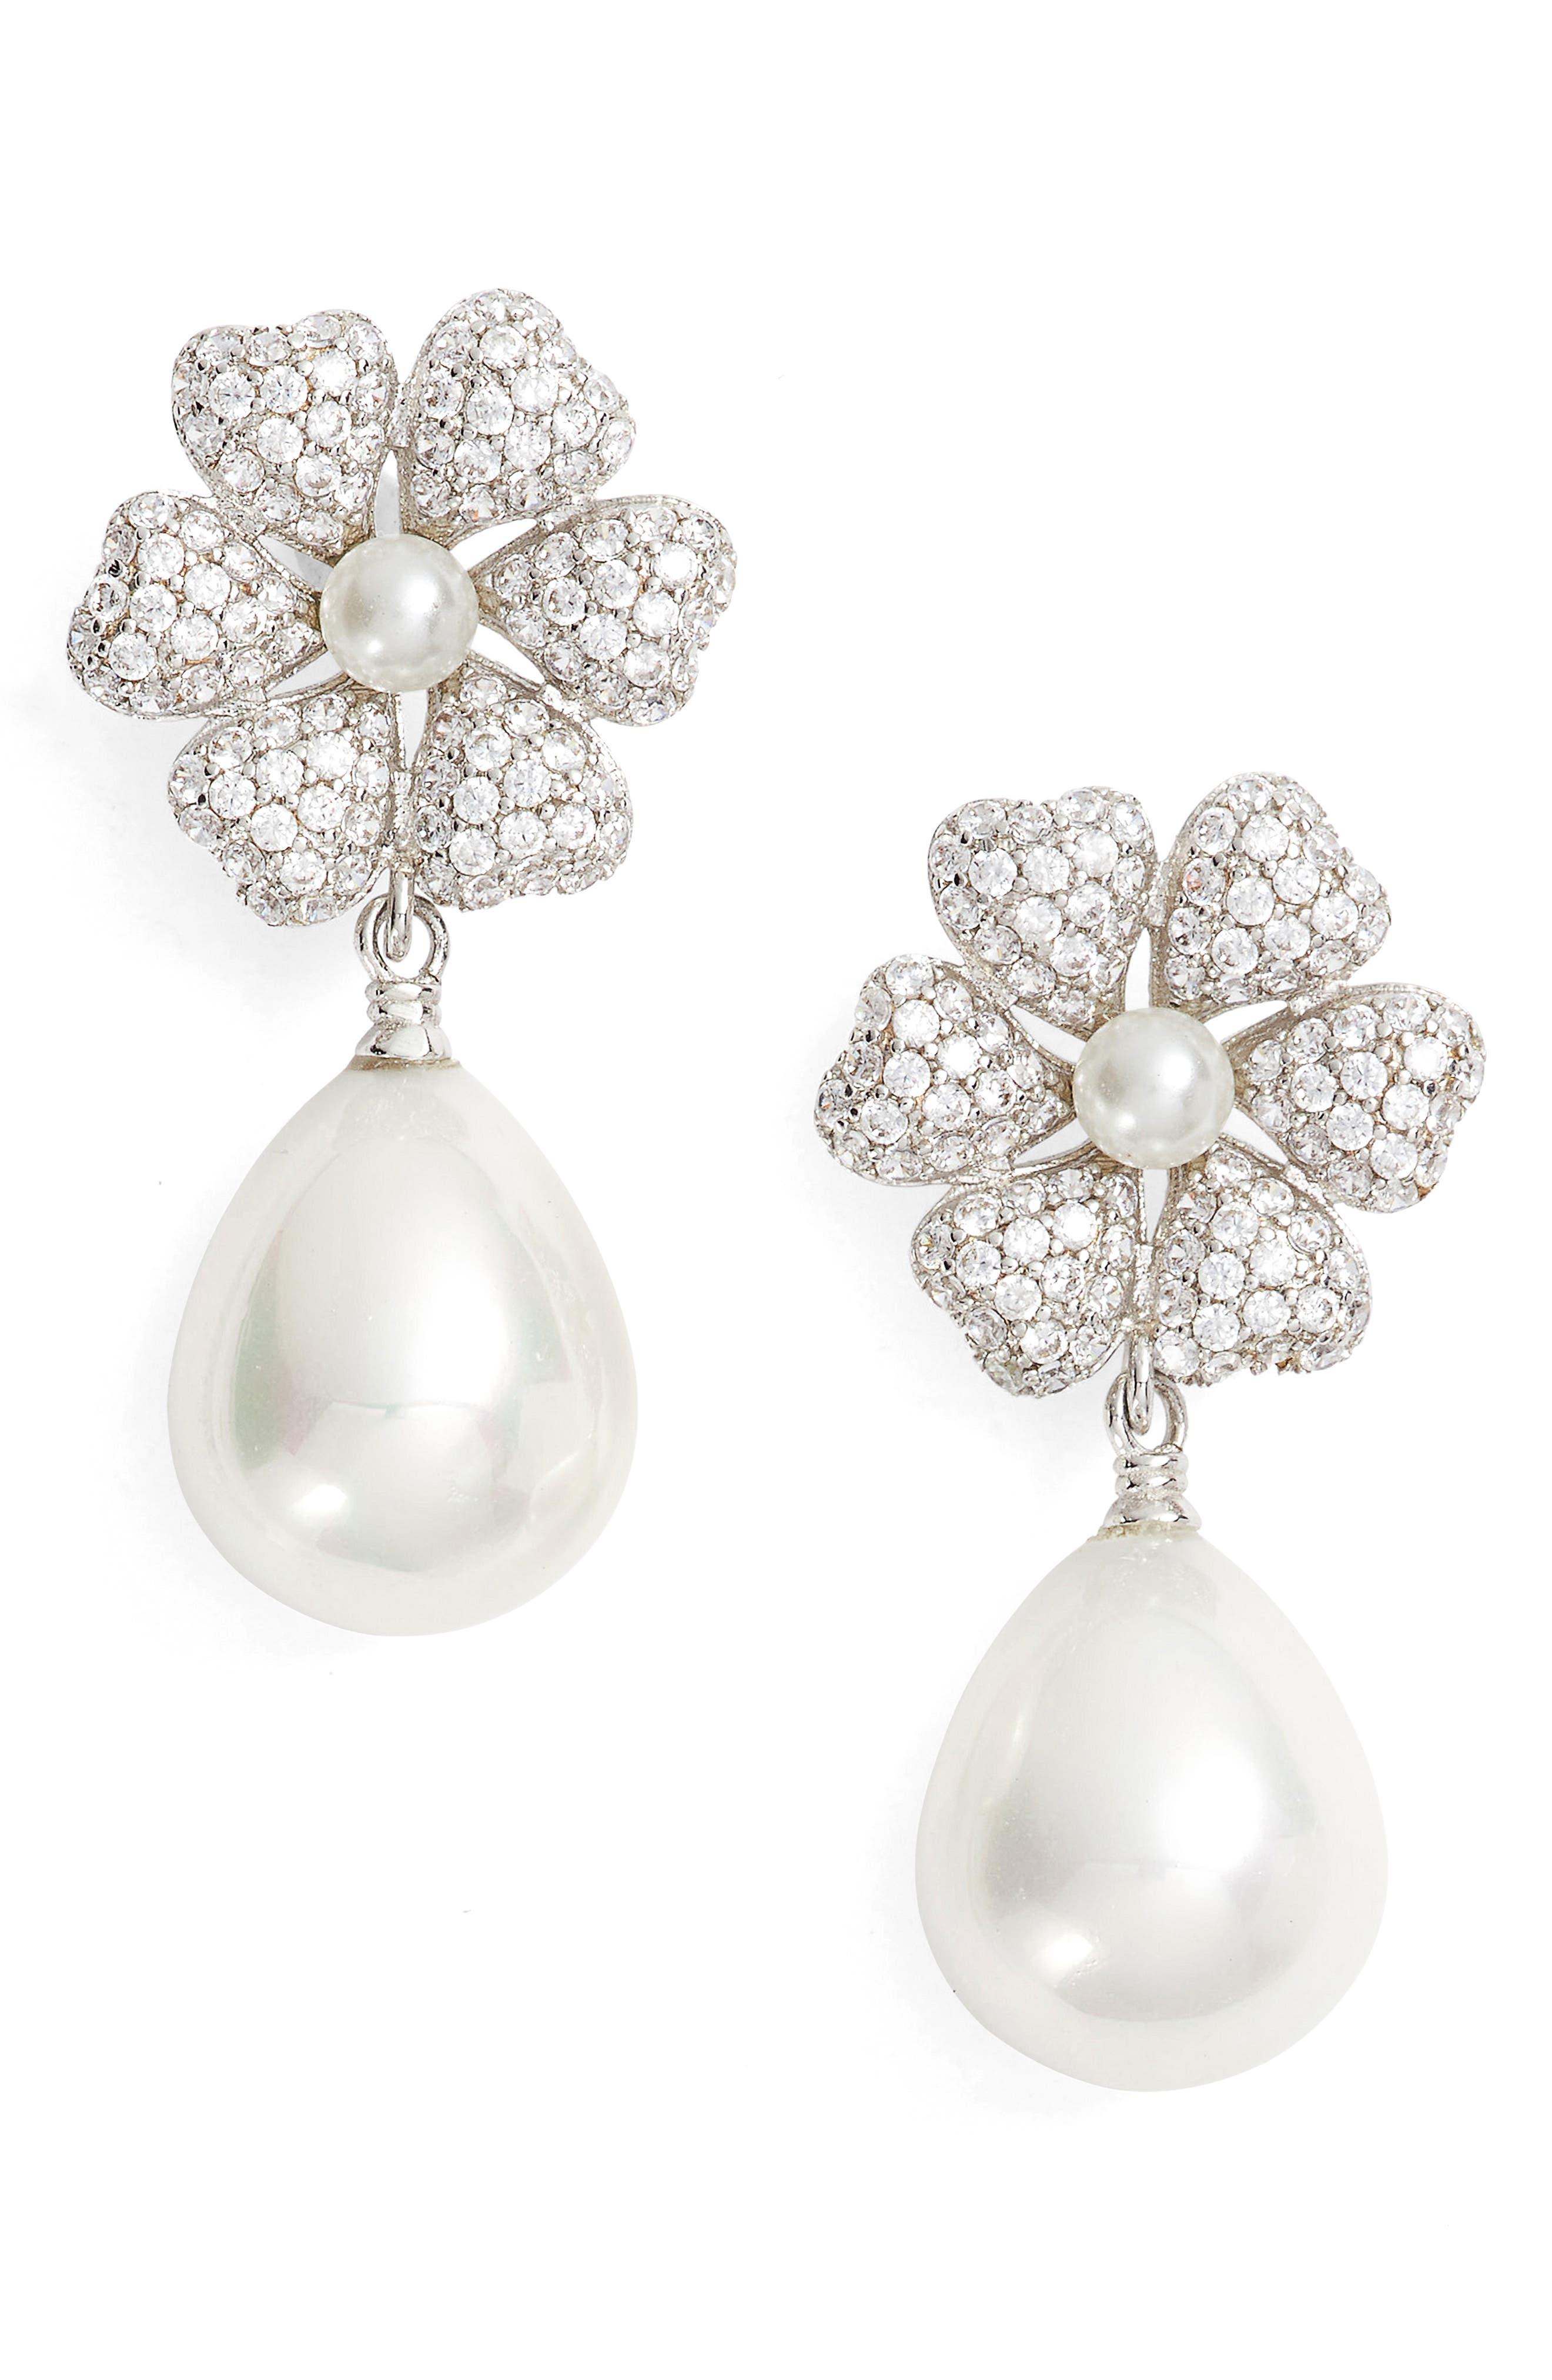 Imitation Pearl & Crystal Drop Earrings,                             Main thumbnail 1, color,                             Ivory Pearl / Silver